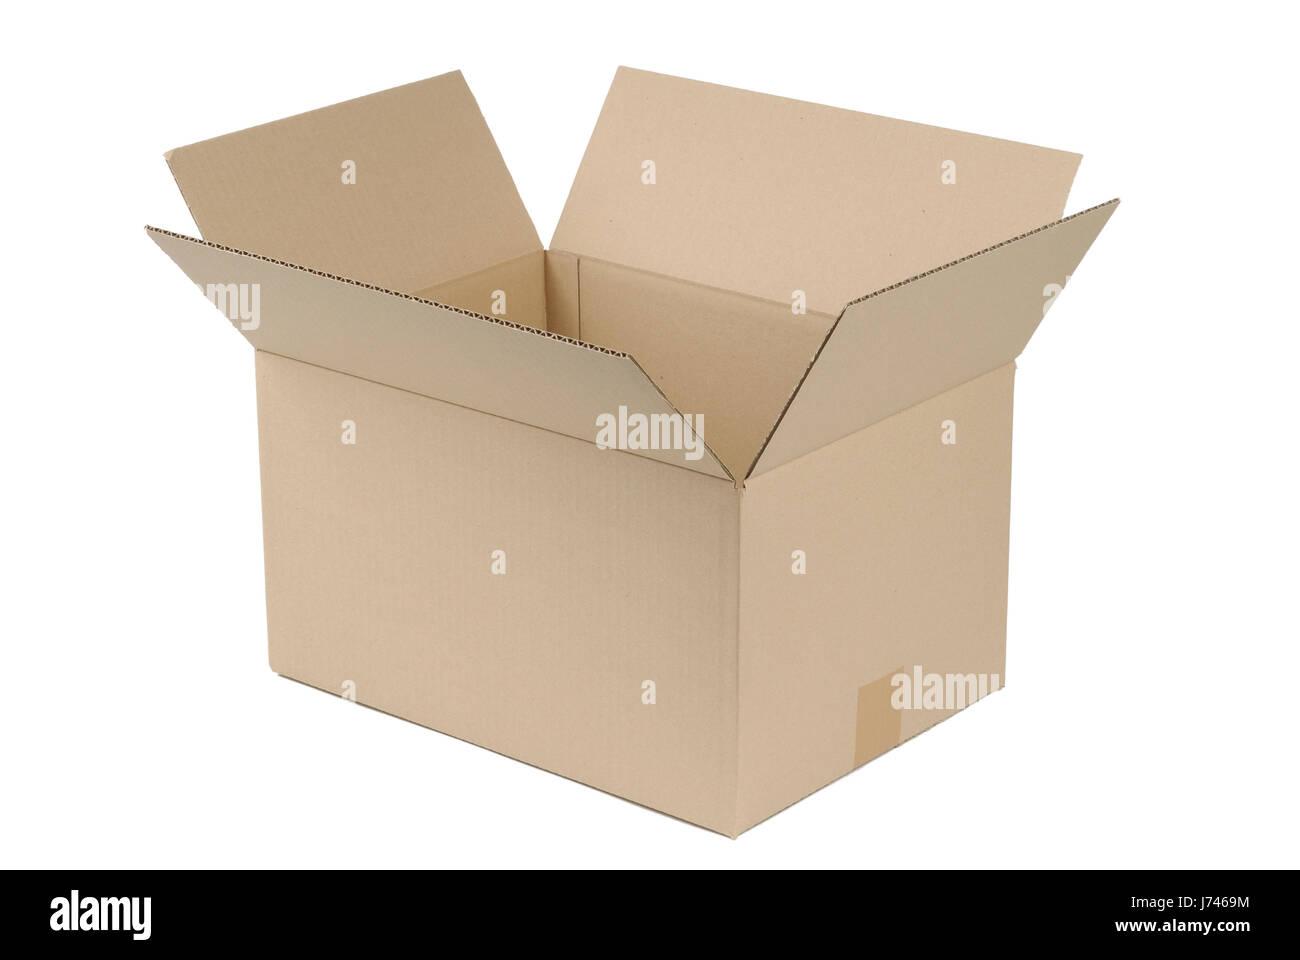 cardboard box on white background - Stock Image